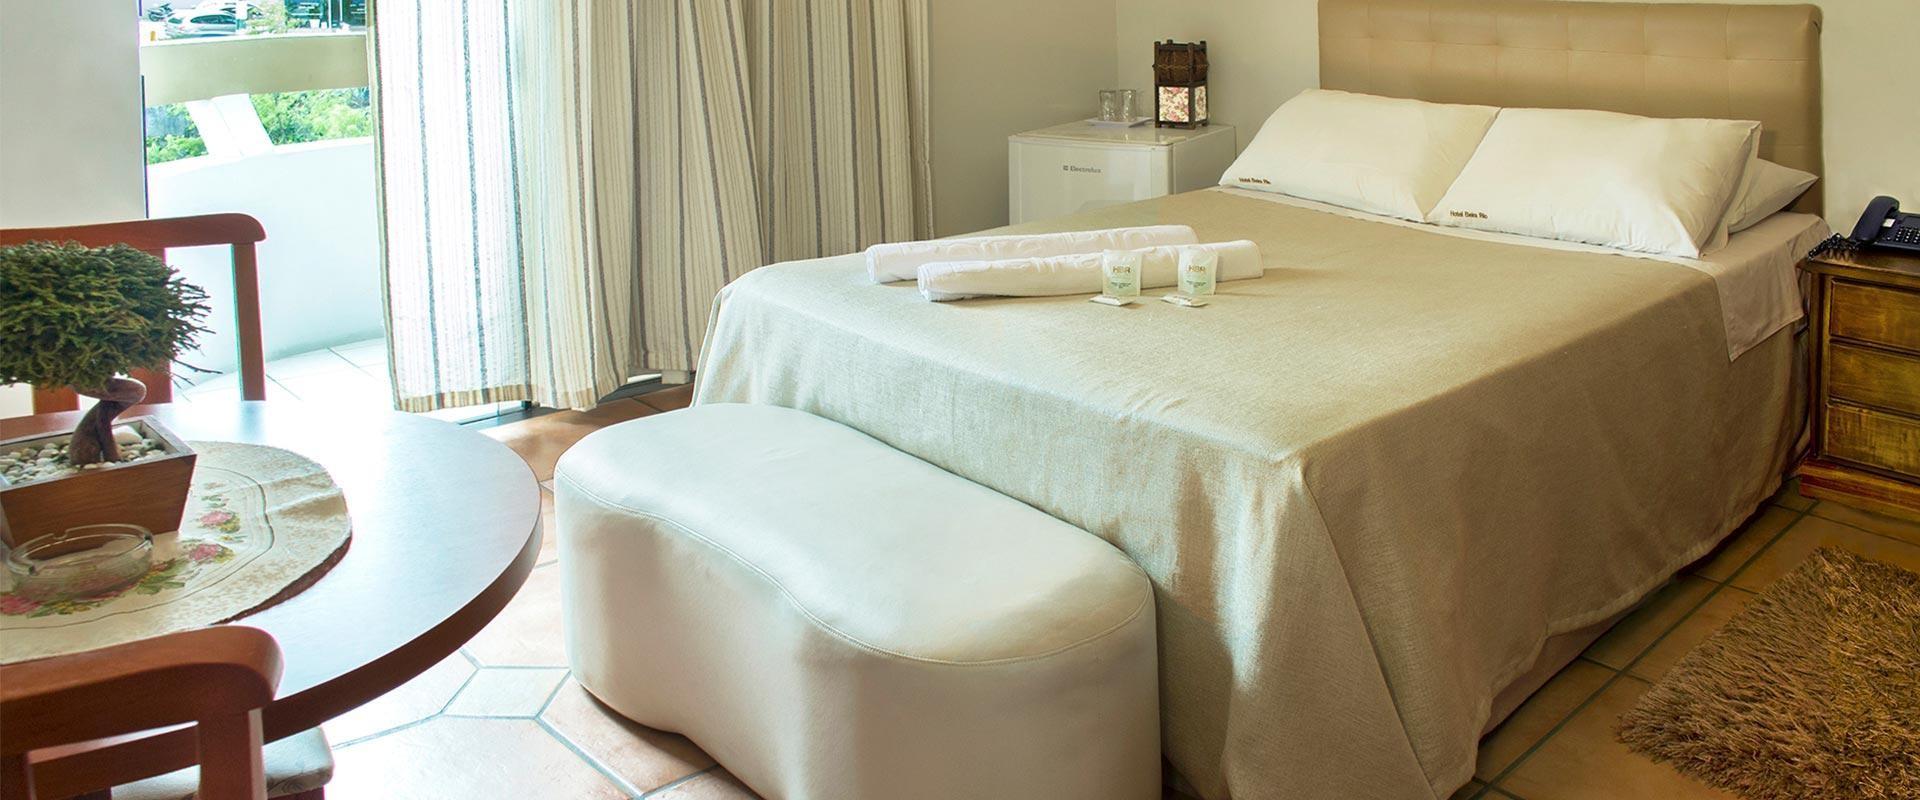 hotel-brusque-quarto-casal-luxo1